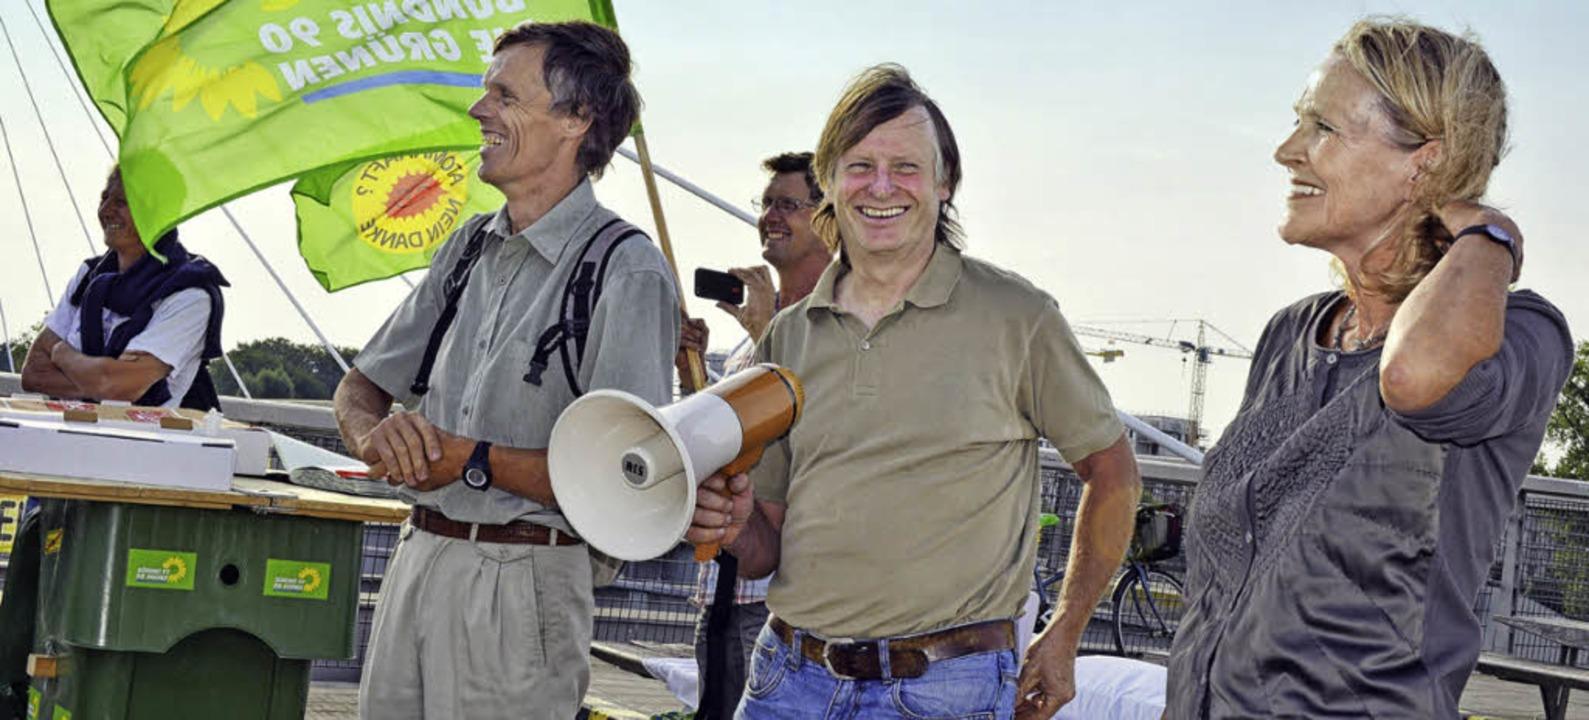 Ludwig Kornmeier mit Megaphon und Sylvia Kotting-Uhl (rechts)   | Foto: osc